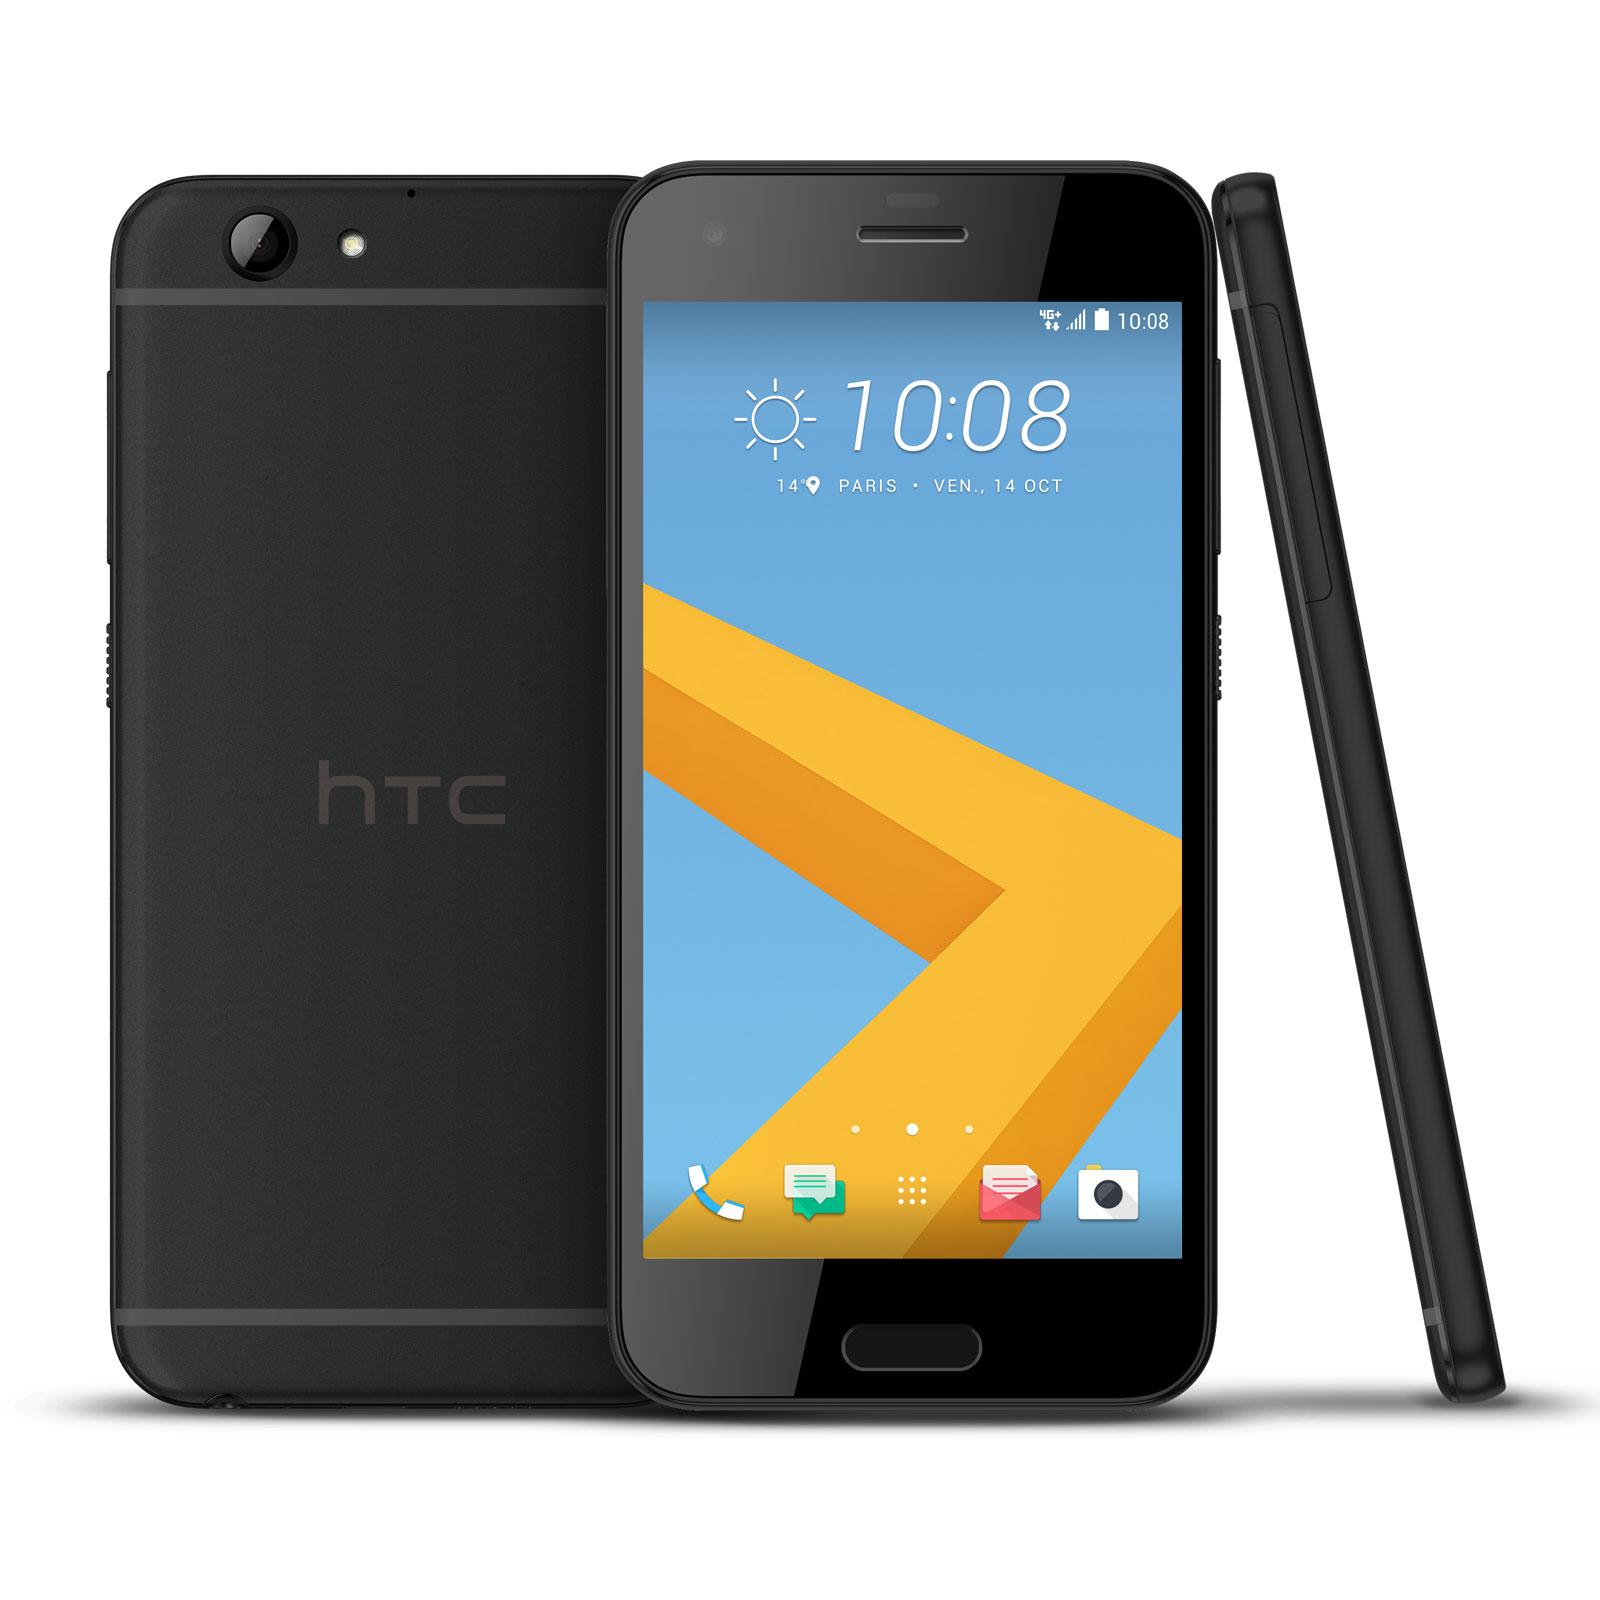 htc one a9s noir mobile smartphone htc sur ldlc. Black Bedroom Furniture Sets. Home Design Ideas